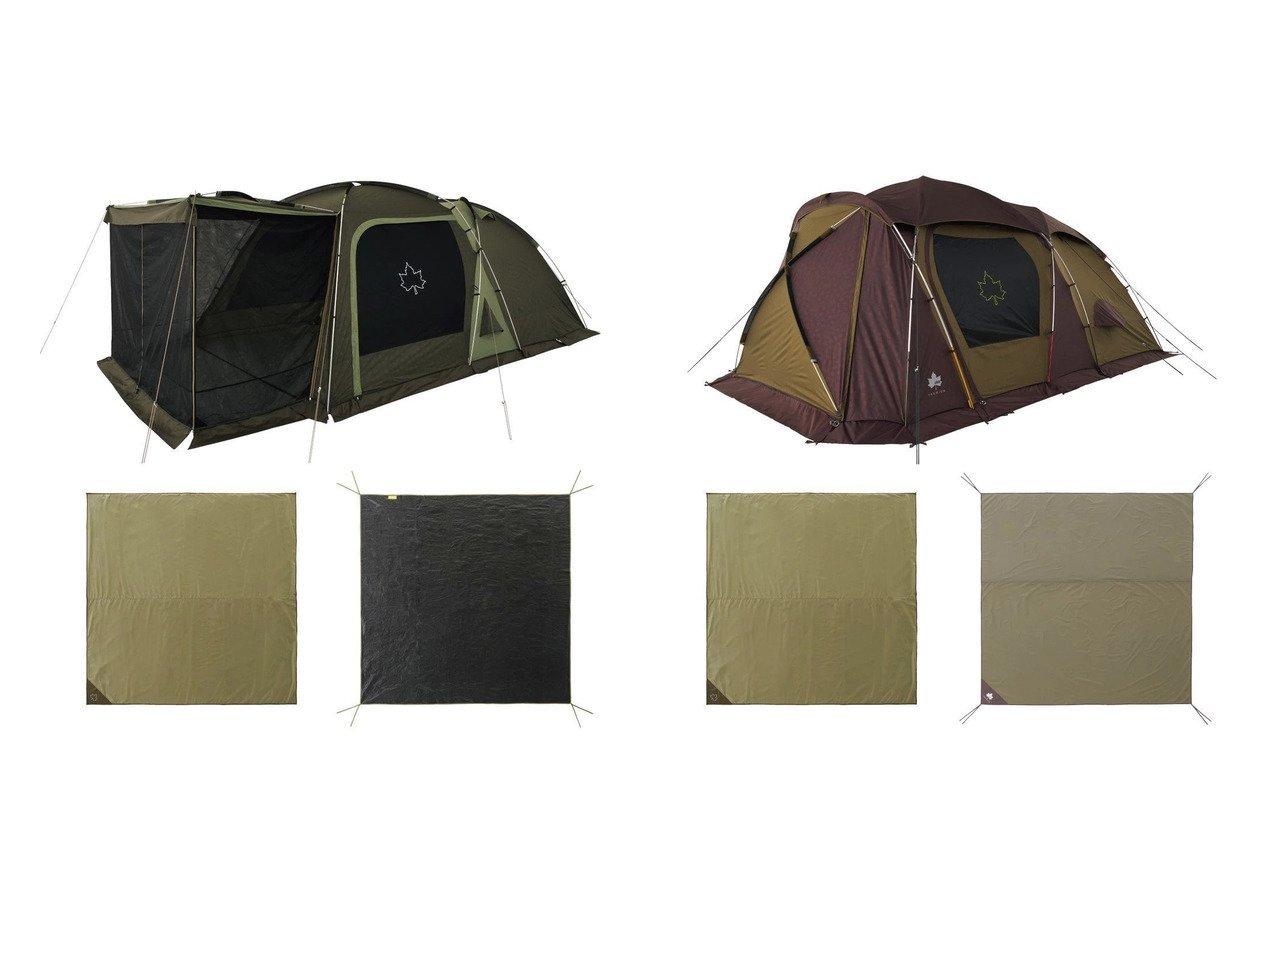 【LOGOS/ロゴス】のファミリーテント ドーム テントチャレンジセットneos 3ルームドゥーブル XL-BJ 71809559&ファミリーテント ドーム テントチャレンジセットプレミアム PANELグレートドゥーブル XL-BJ 71809558 おすすめ!人気キャンプ・アウトドア用品の通販 おすすめで人気の流行・トレンド、ファッションの通販商品 メンズファッション・キッズファッション・インテリア・家具・レディースファッション・服の通販 founy(ファニー) https://founy.com/ インナー 春 Spring コーティング スタンダード タフタ 定番 Standard フレーム プレミアム S/S・春夏 SS・Spring/Summer ホーム・キャンプ・アウトドア Home,Garden,Outdoor,Camping Gear キャンプ用品・アウトドア  Camping Gear & Outdoor Supplies テント タープ Tents, Tarp |ID:crp329100000034773